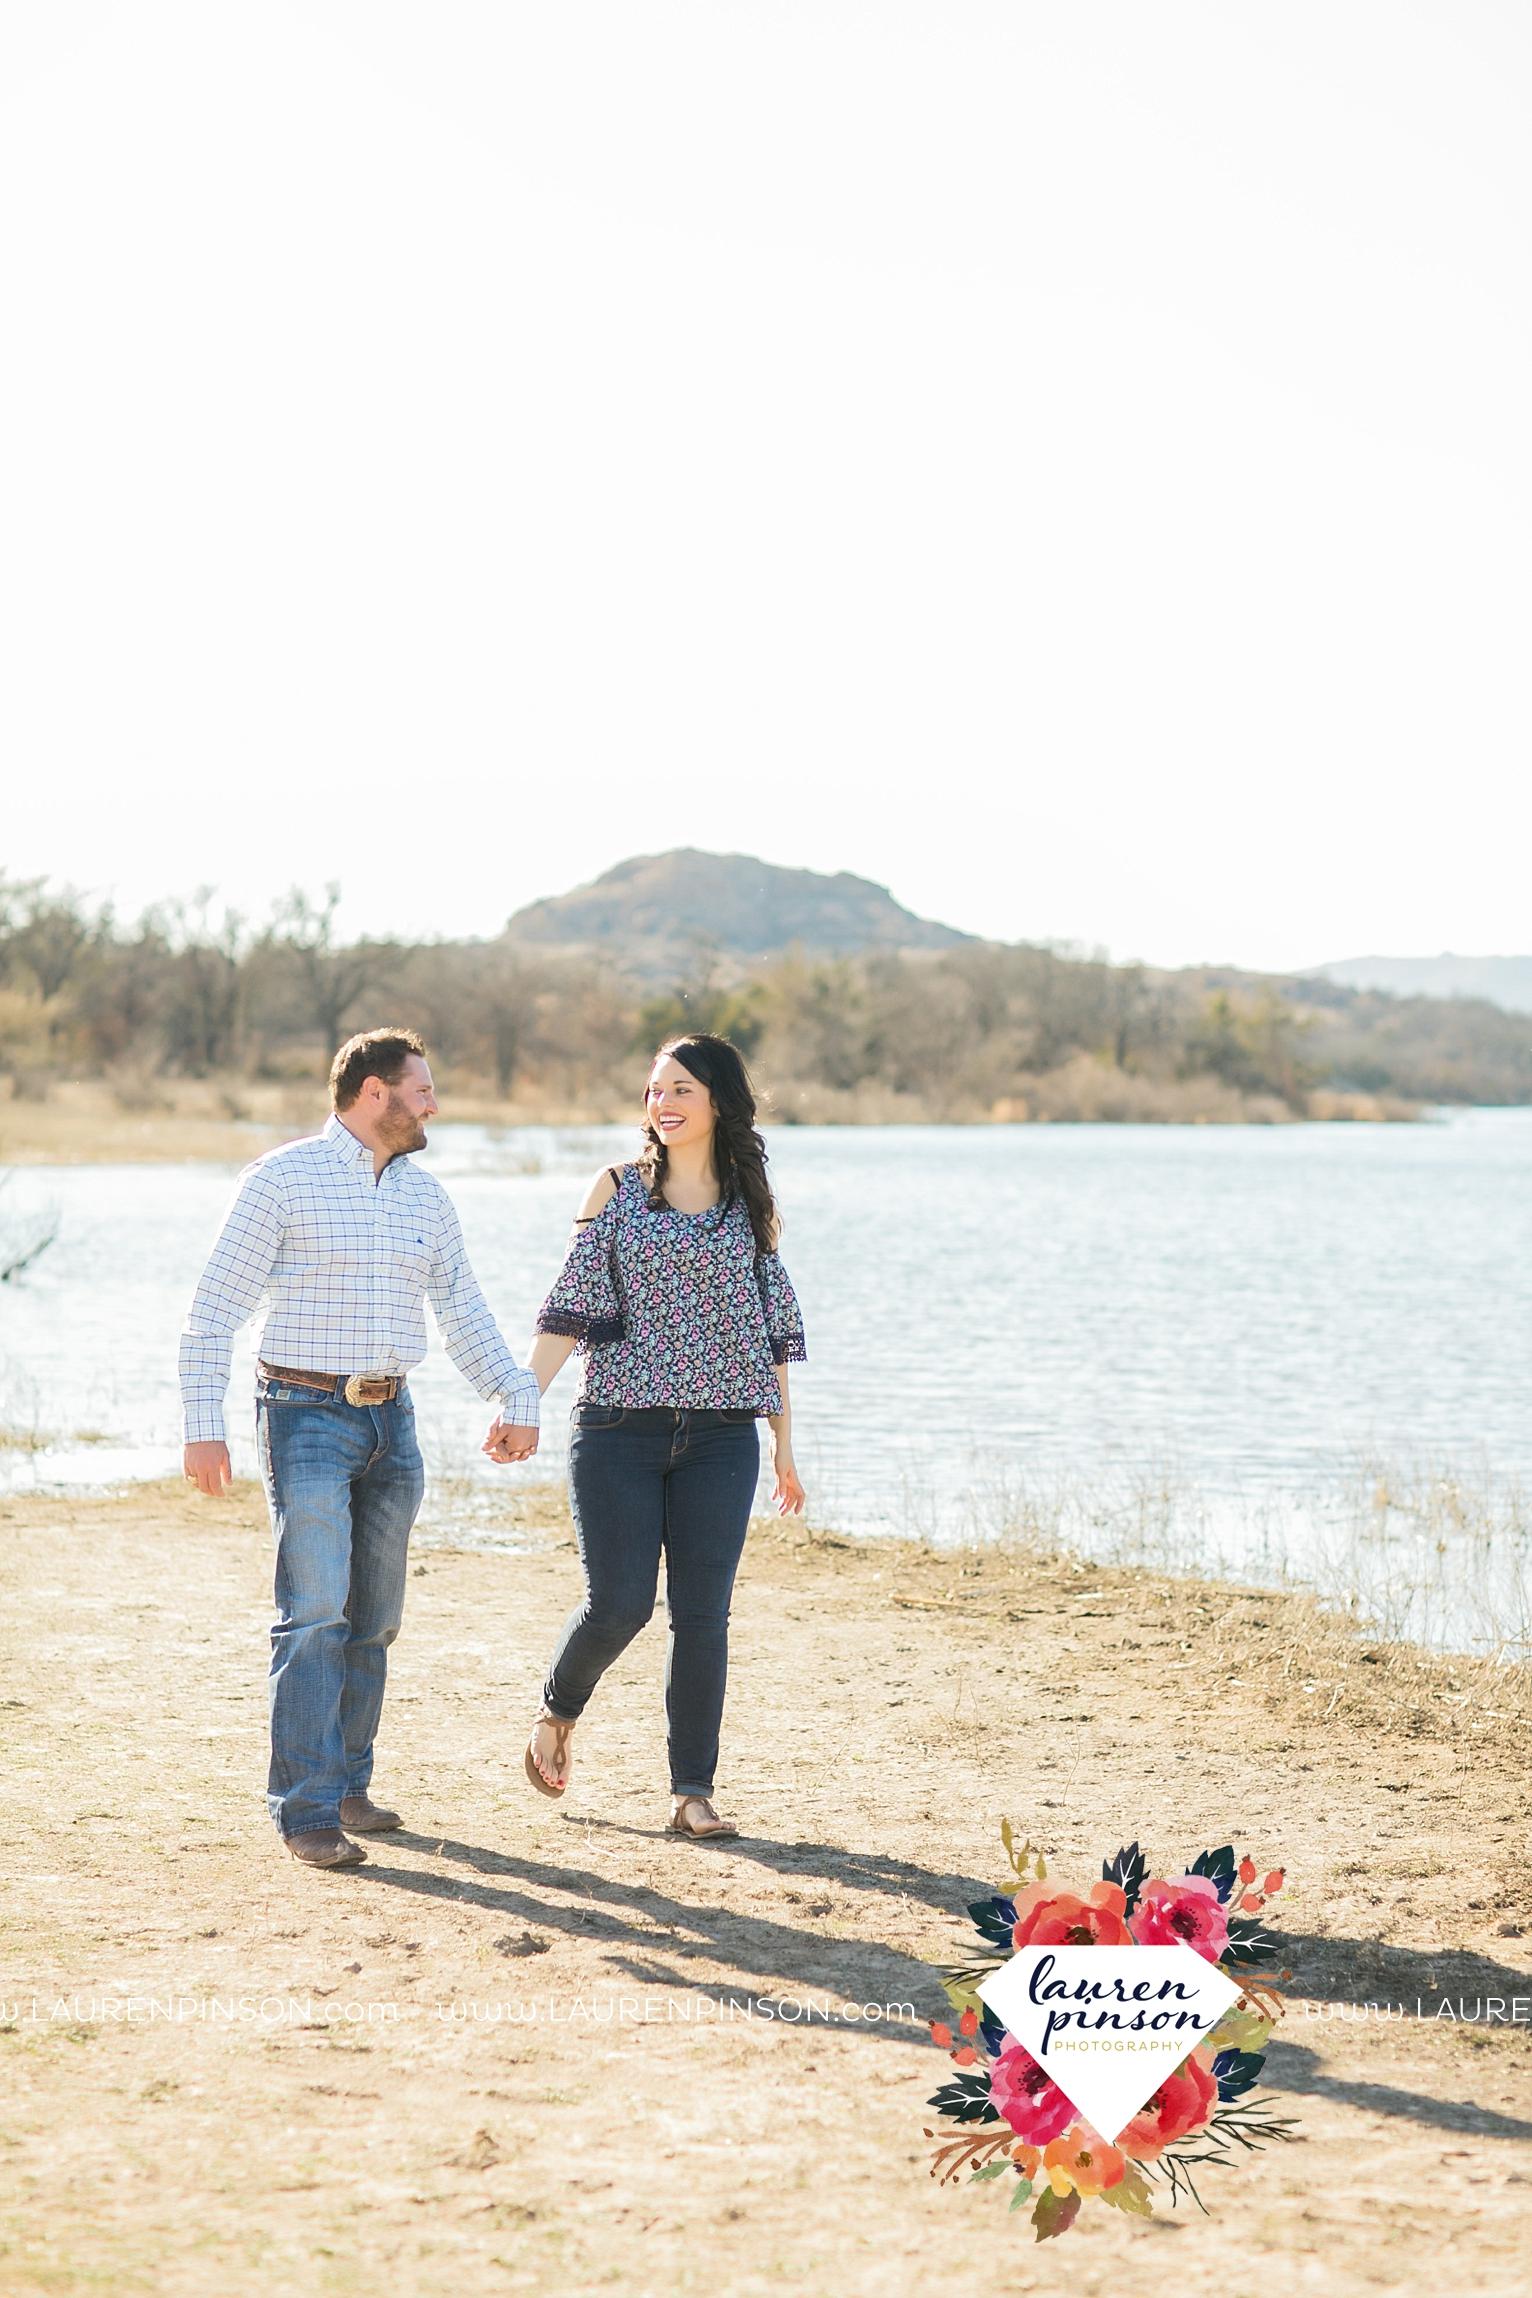 wichita-falls-texas-engagement-photographer-wedding-oklahoma-lawton-wichita-mountains-refuge-outdoors-mountains-engaged_2035.jpg